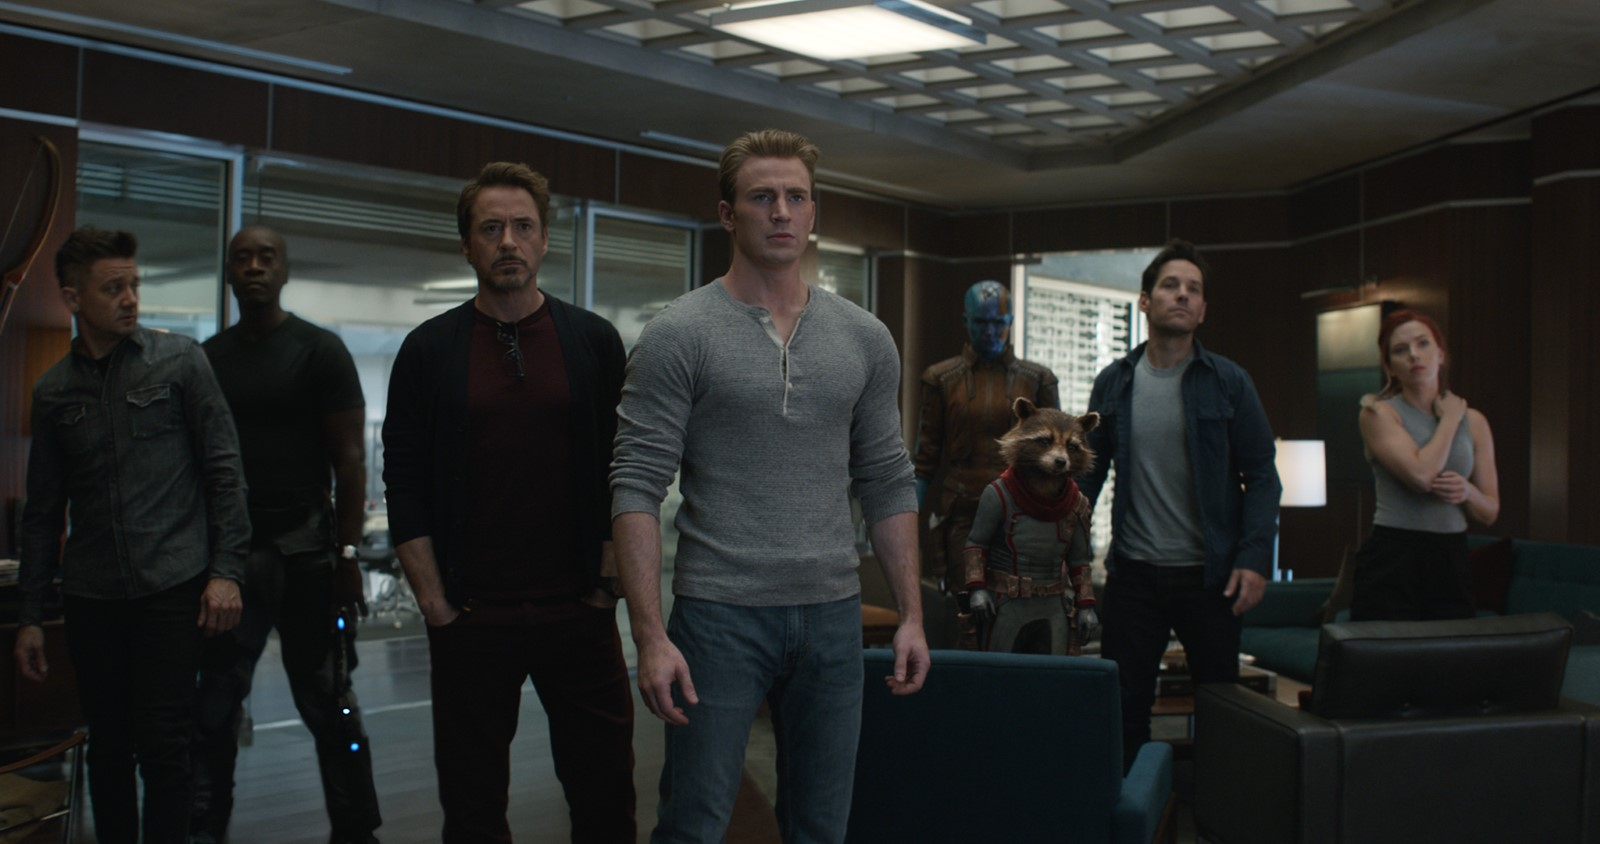 Endgame rapporte environ 1,2 milliard de dollars ce week-end — Avengers